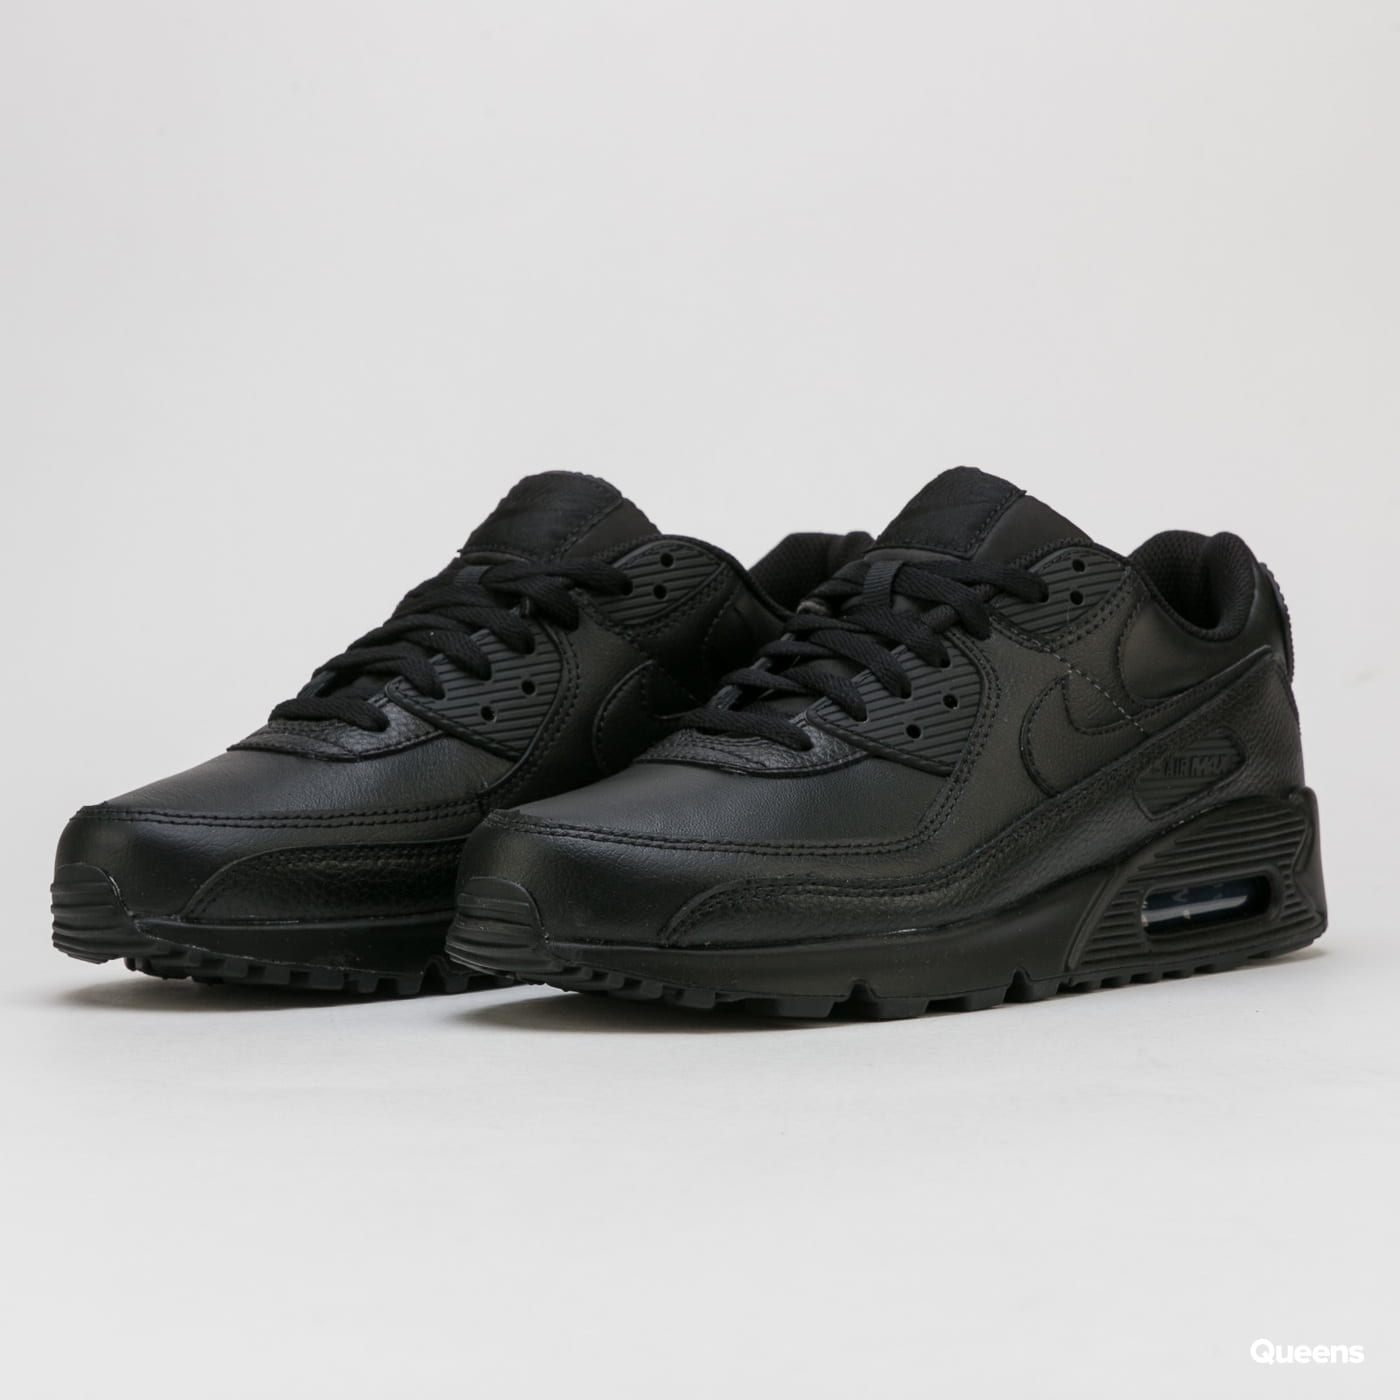 Nike Air Max 90 Leather black / black